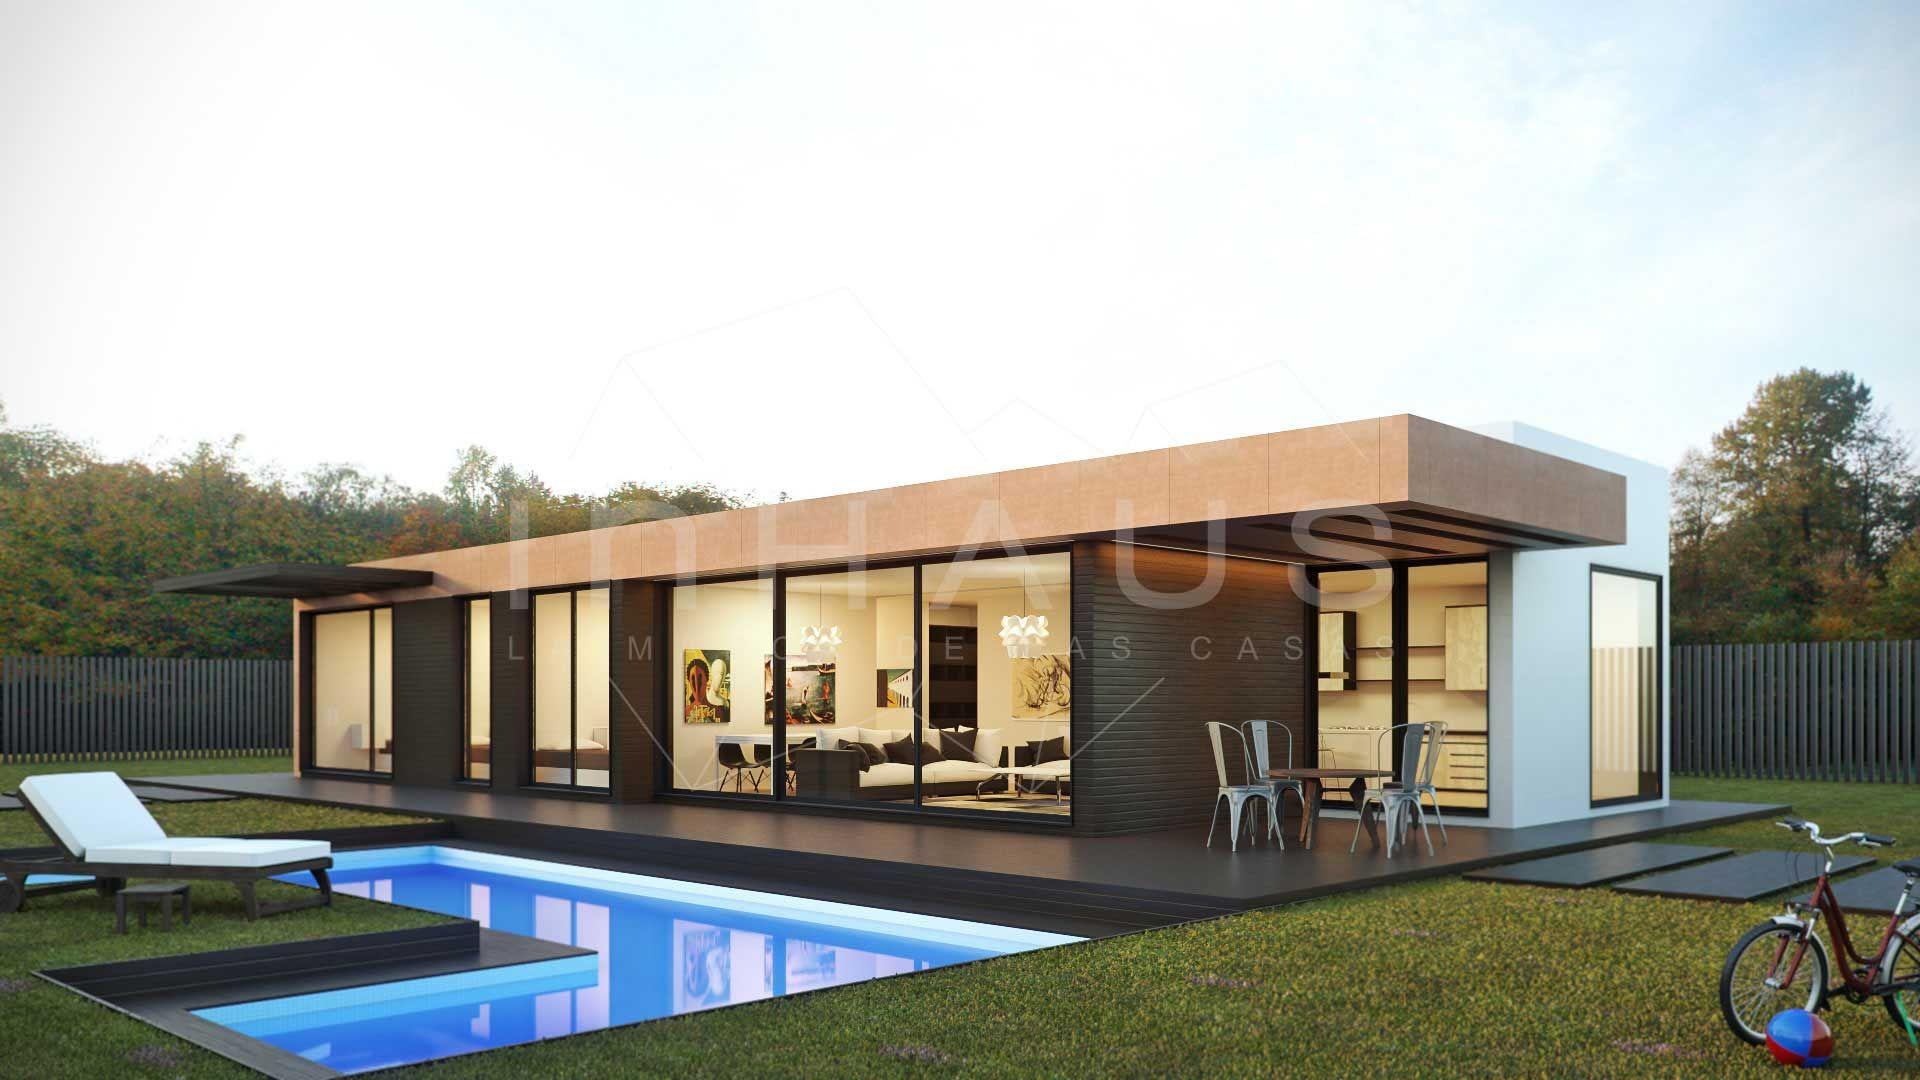 Casas prefabricadas minimalistas inhaus vista principal - Casas prefabricadas mediterraneas ...